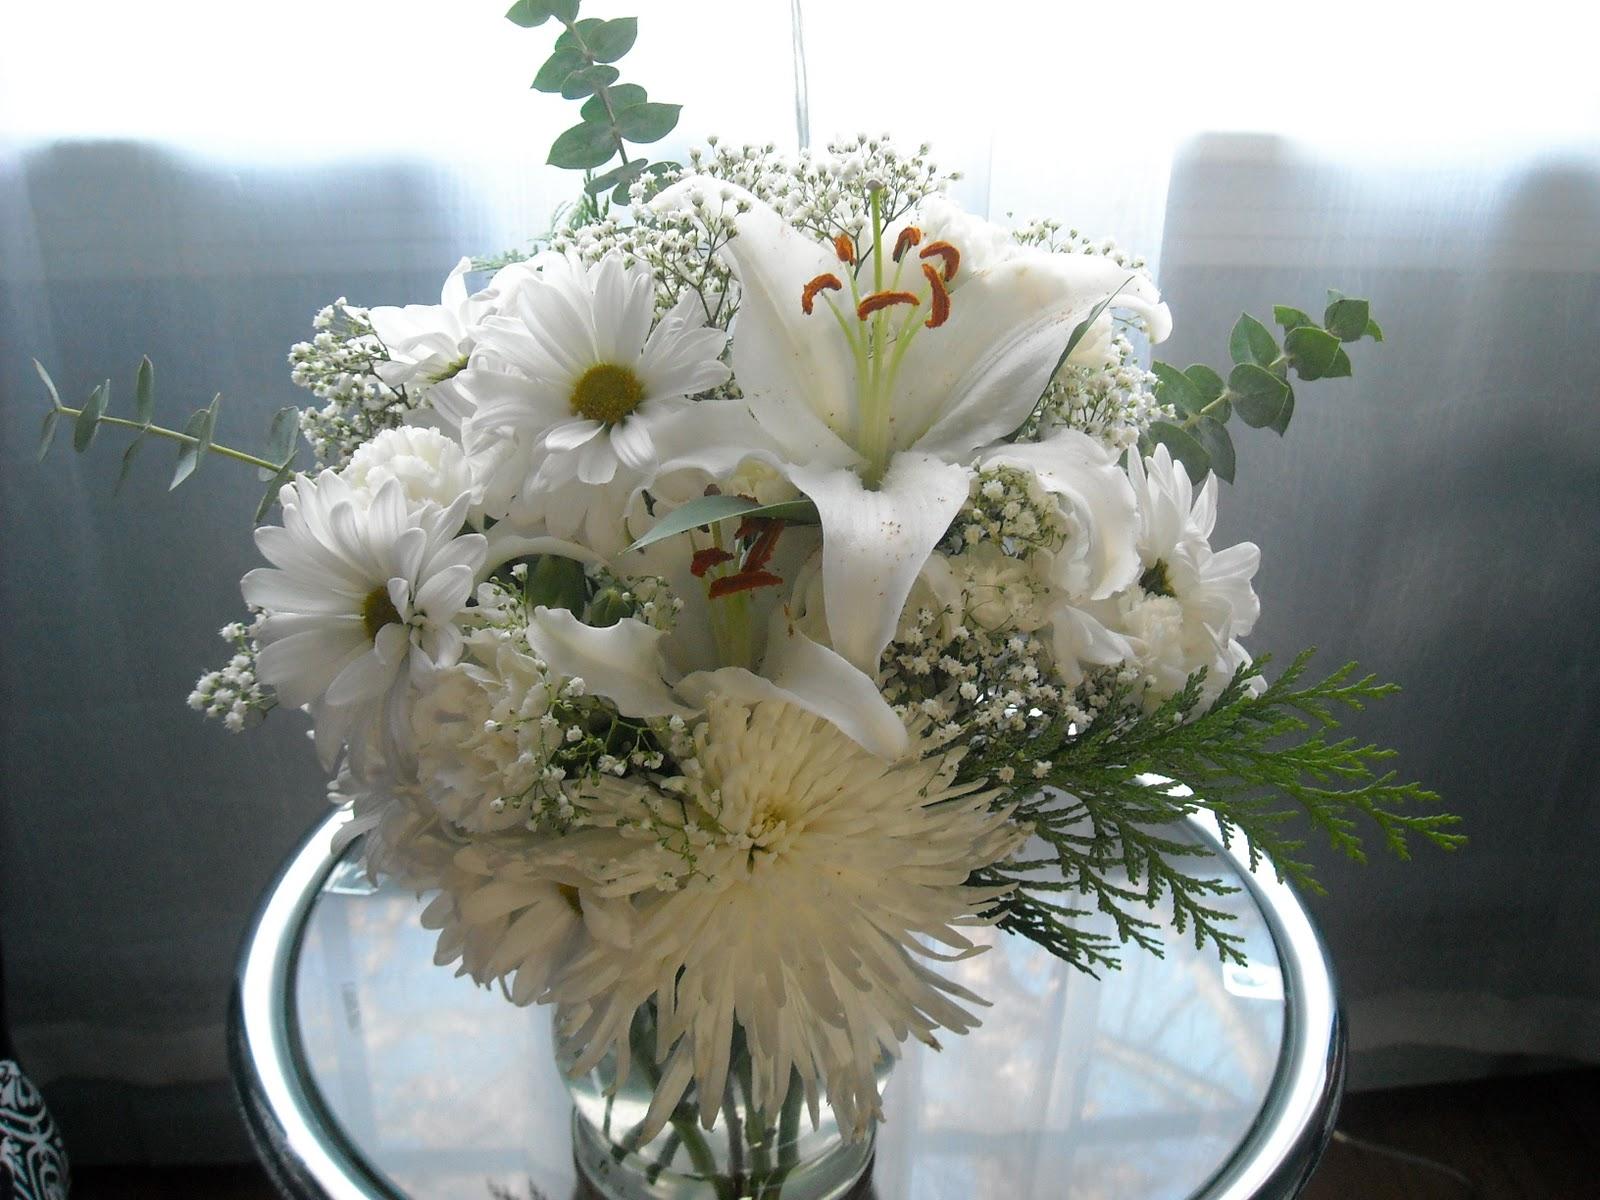 The Creative Grapevine Winter White Flower Arrangement